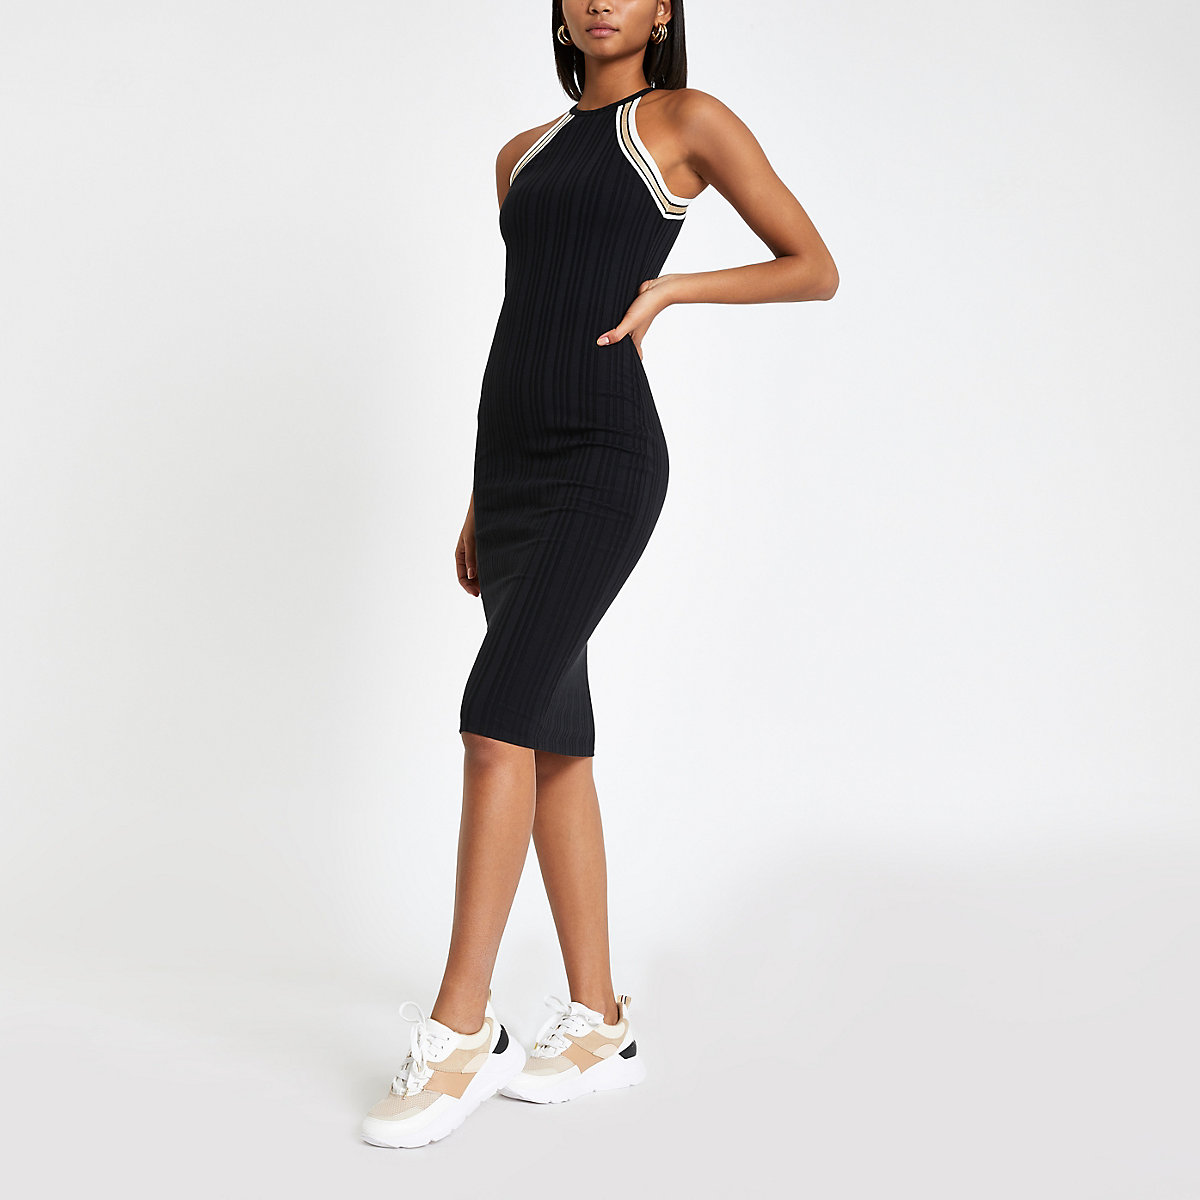 Black halter neck midi bodycon dress